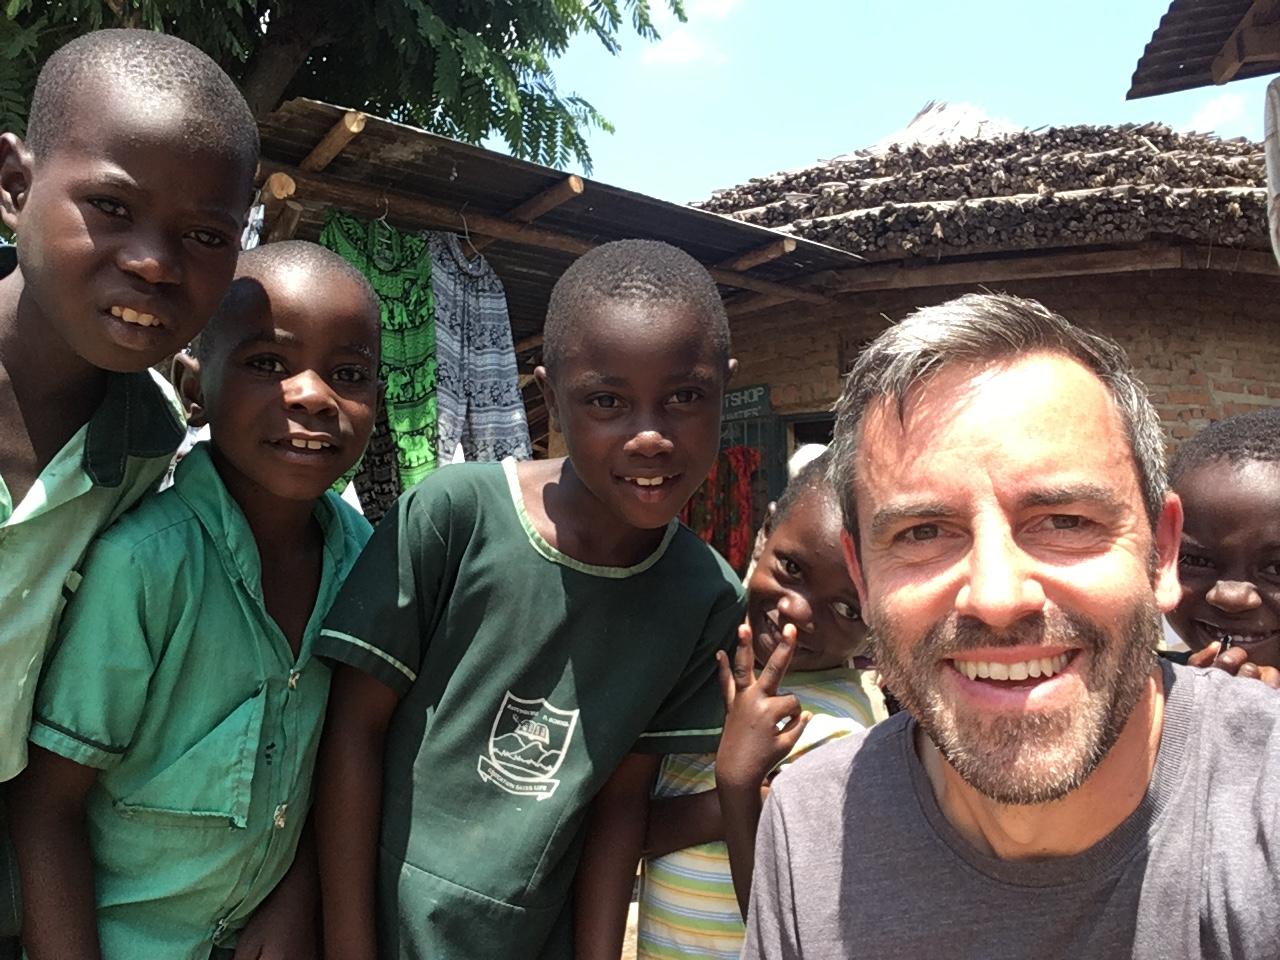 Gorilla Trekking in Uganda   unser Besuch bei den sanften Riesen uganda sonne safari reisebericht new afrika  TUI Berlin Reisebuero Gorillatrekking Uganda Kinder